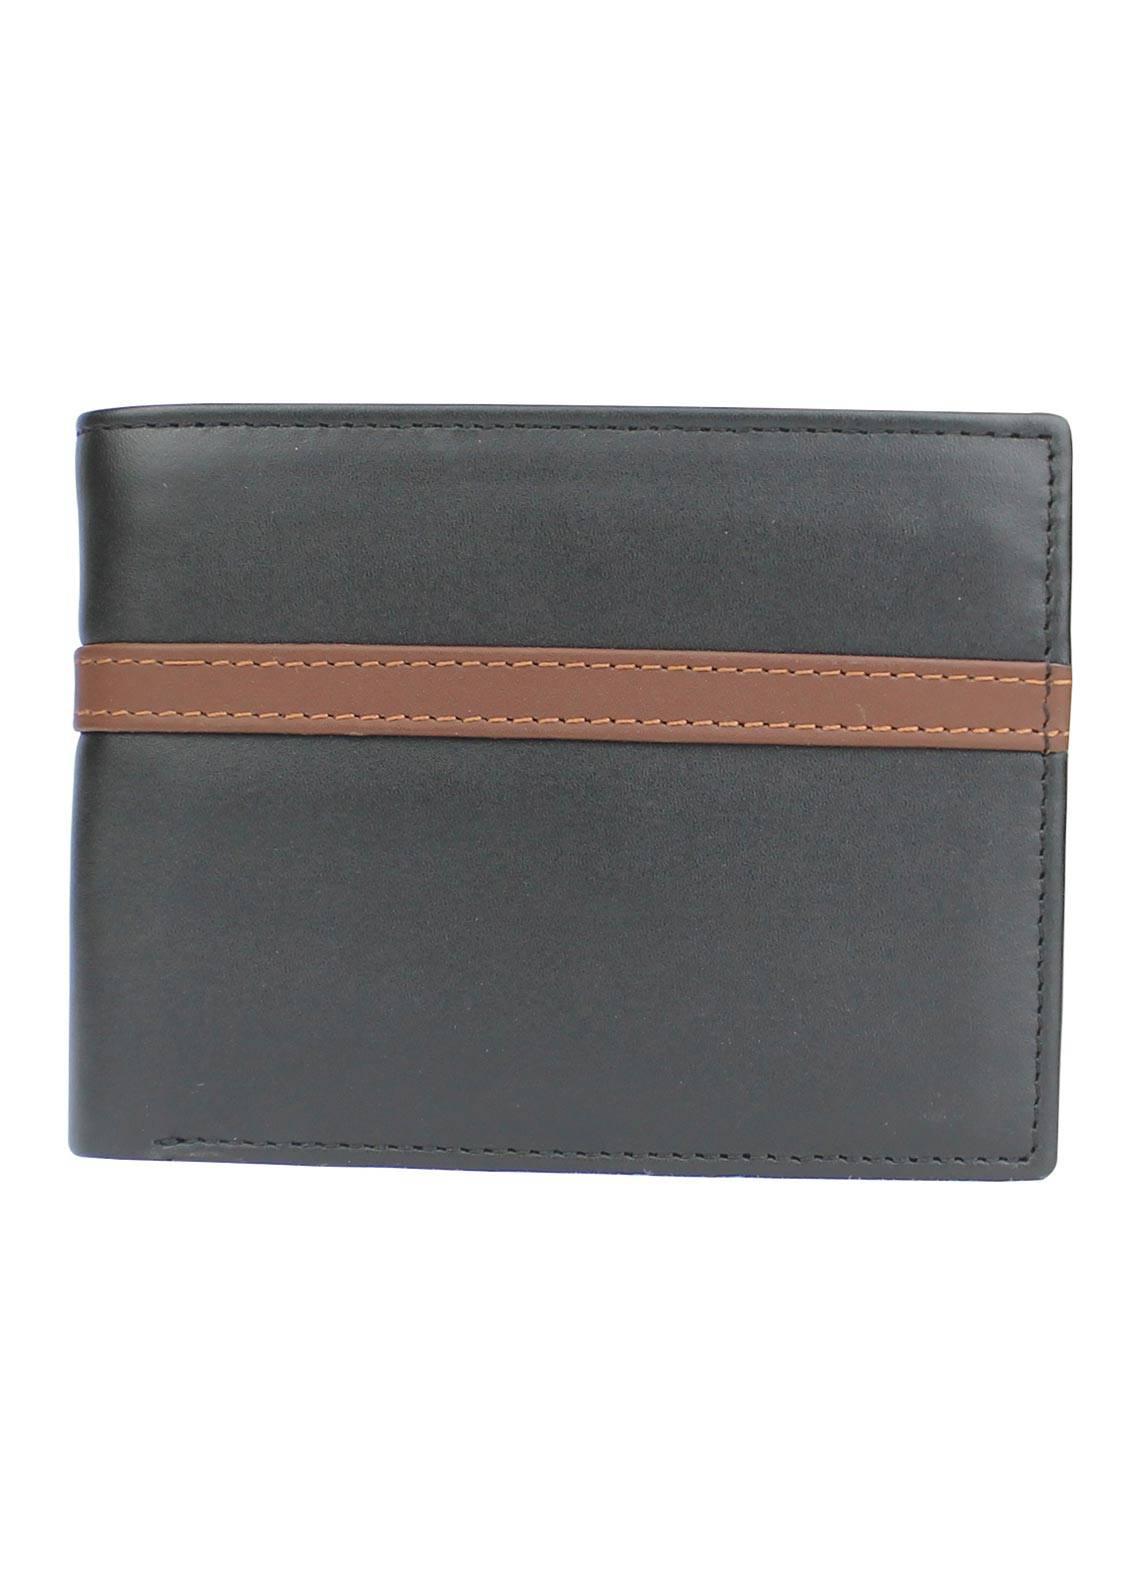 Shahzeb Saeed Plain Texture Leather  Wallet W-079 - Men's Accessories